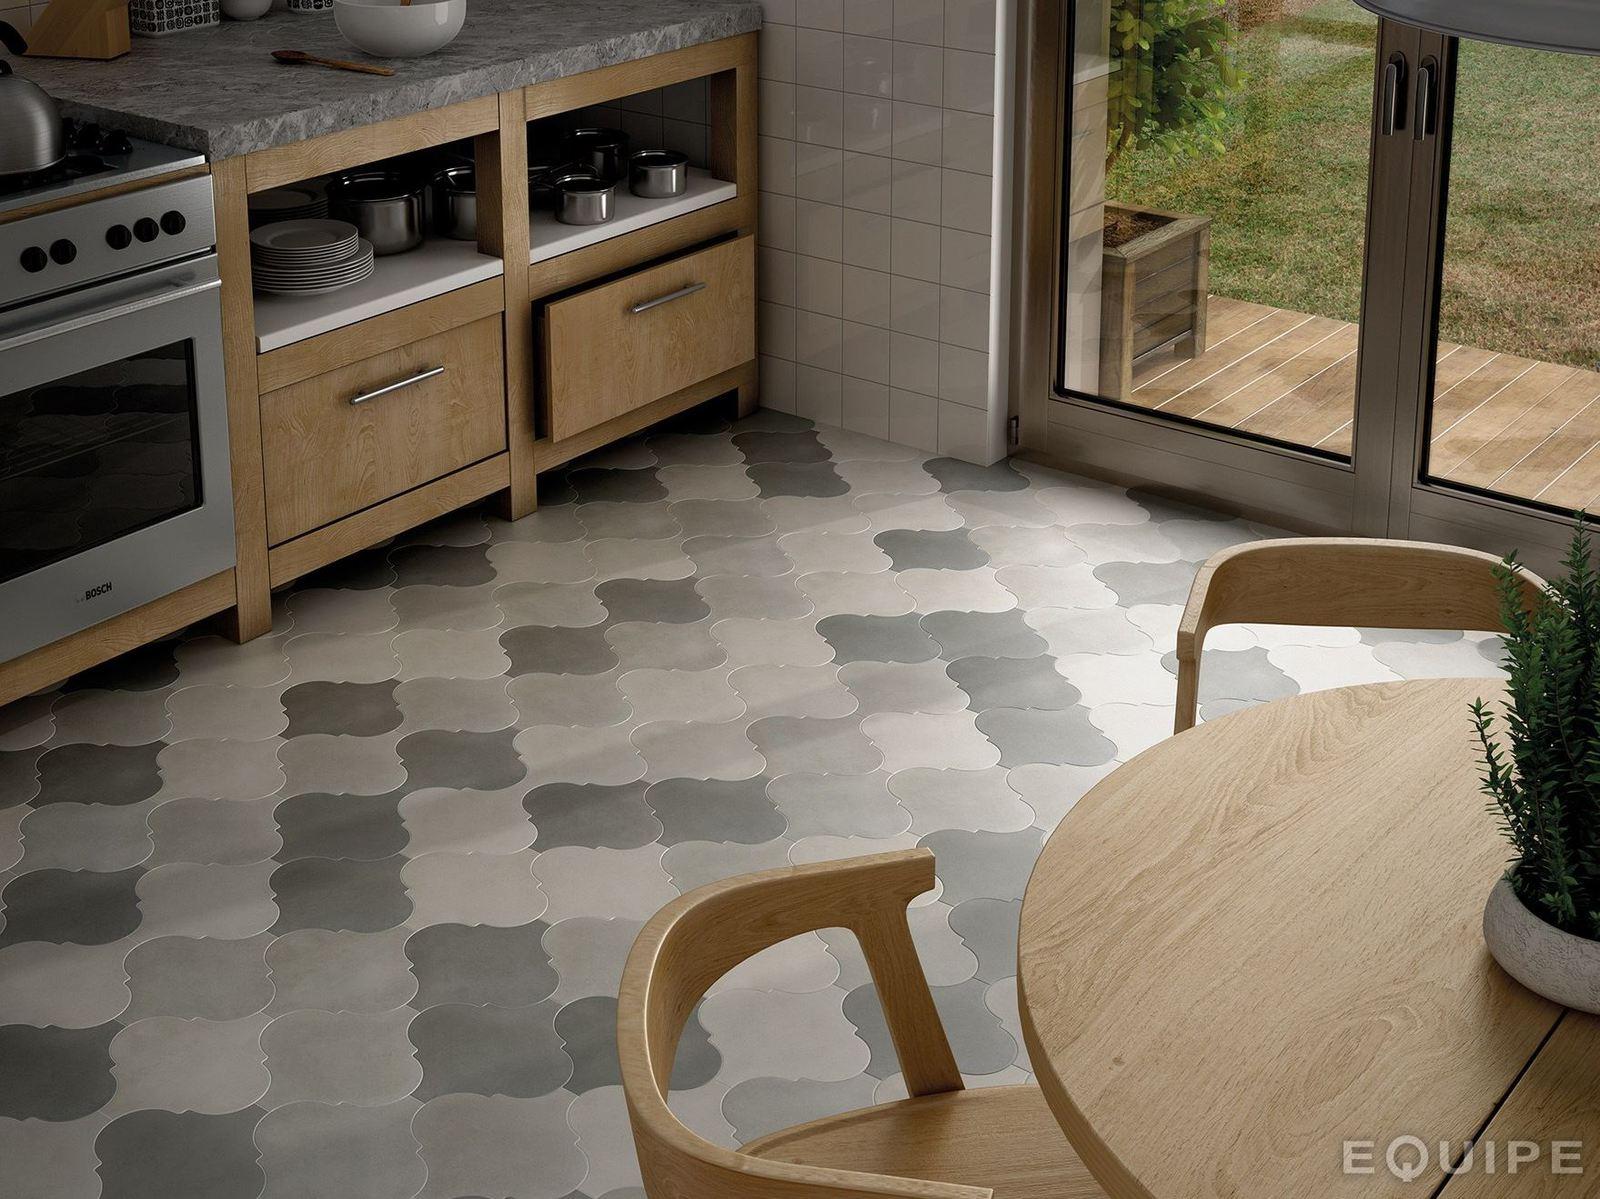 21 arabesque tile ideas for floor wall and backsplash kitchen floor tiles View in gallery arabesque tile floor kitchen grey 9